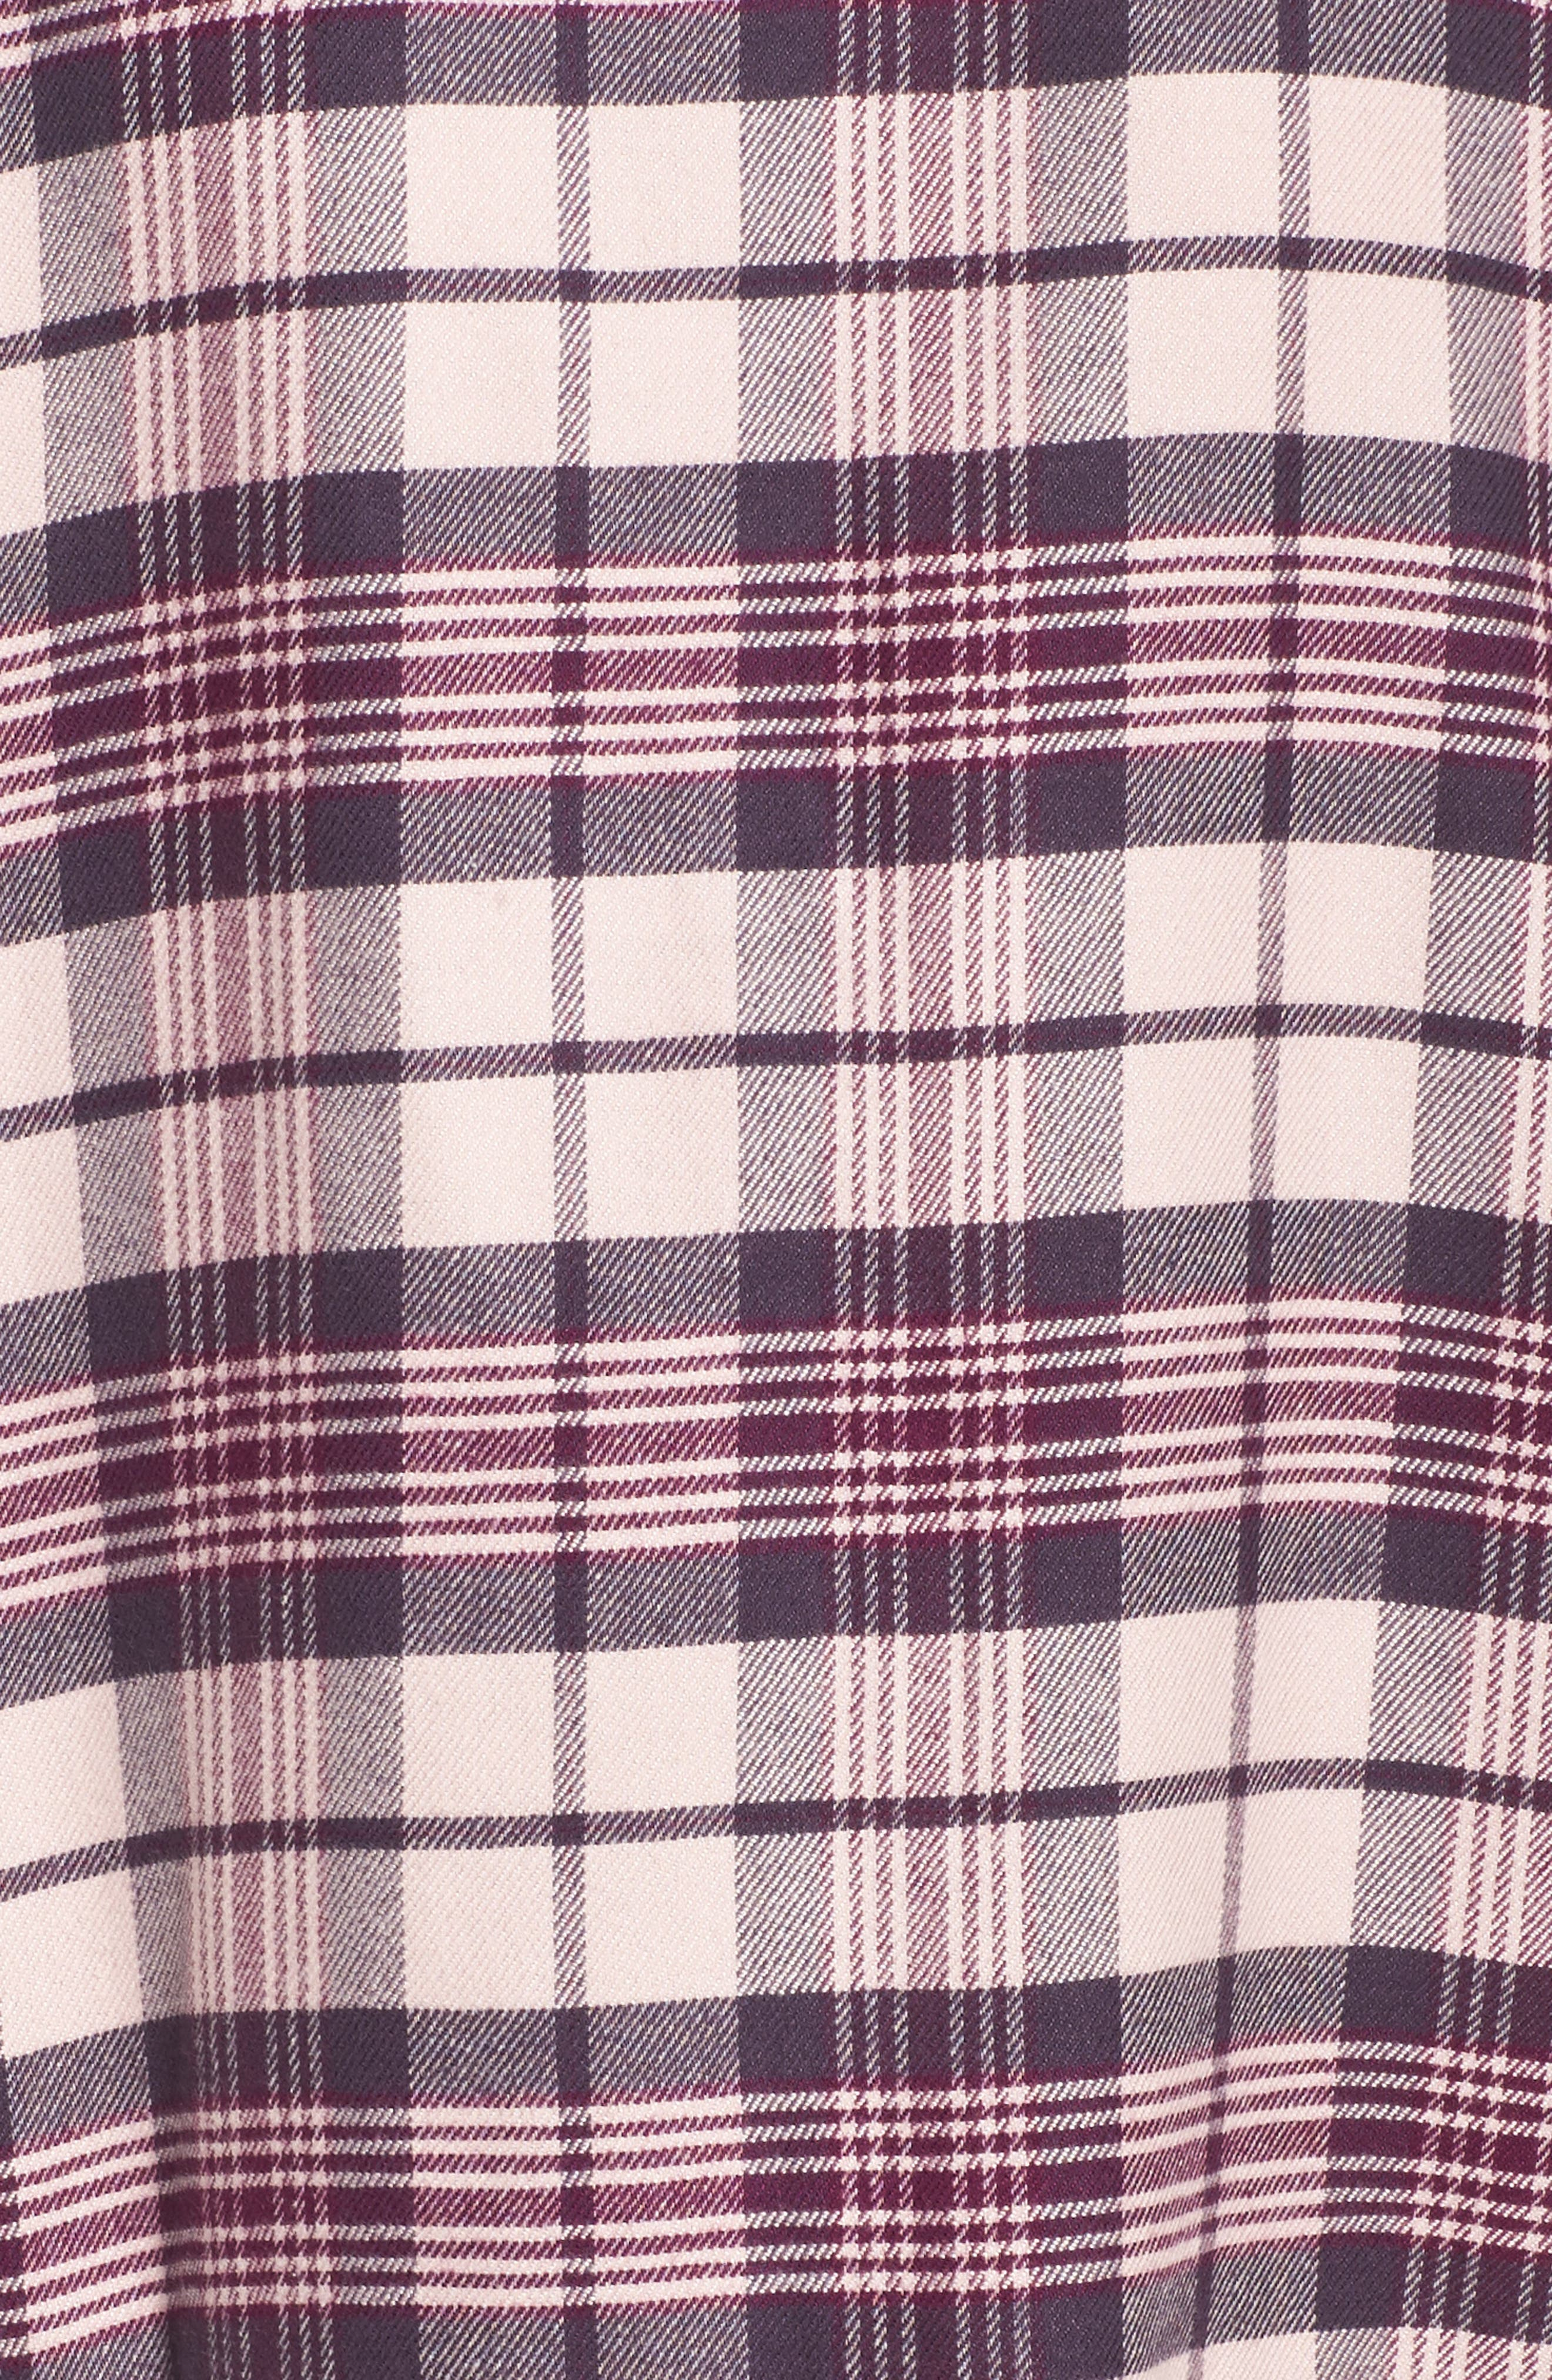 Lingerie Starlight Flannel Pajamas,                             Alternate thumbnail 25, color,